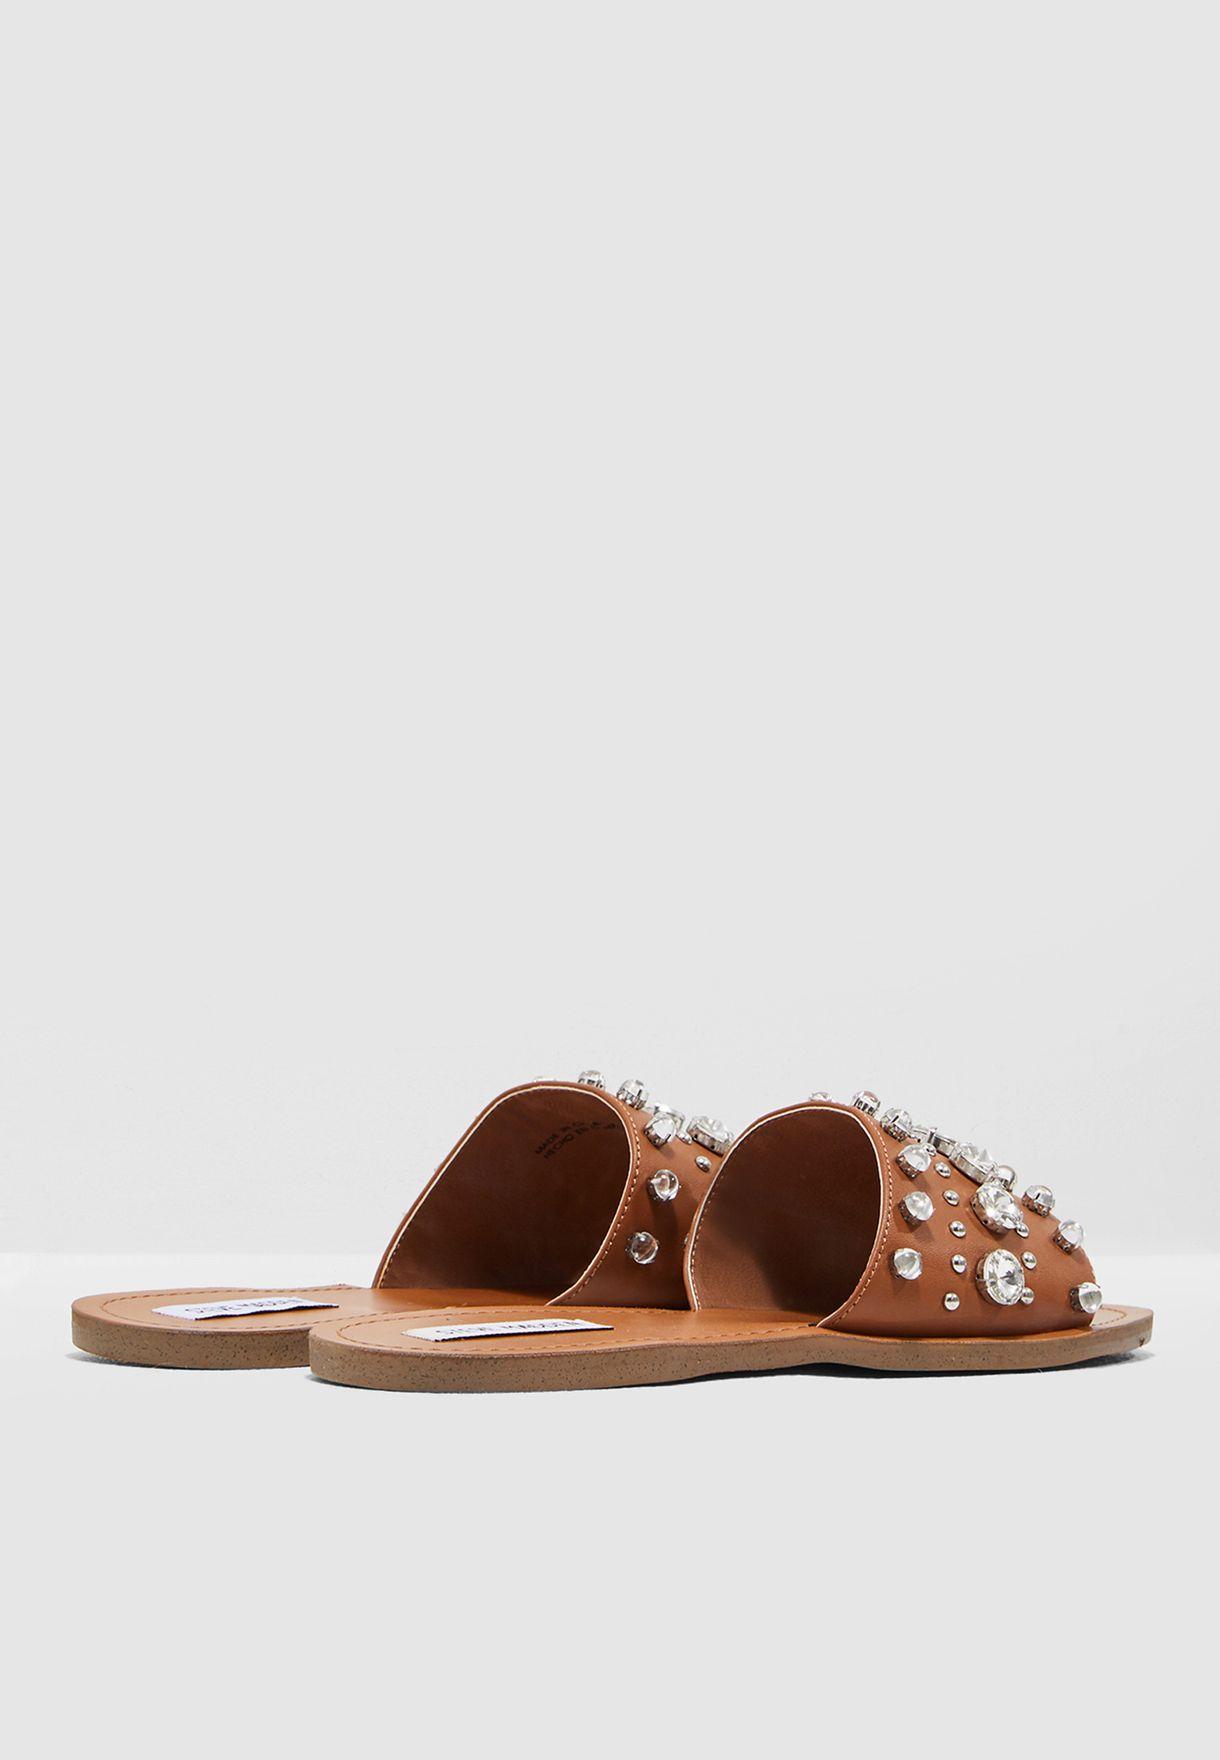 ad9391297 Shop Steve Madden Brown Regent Sandal With Pearl REGENT for Women in ...